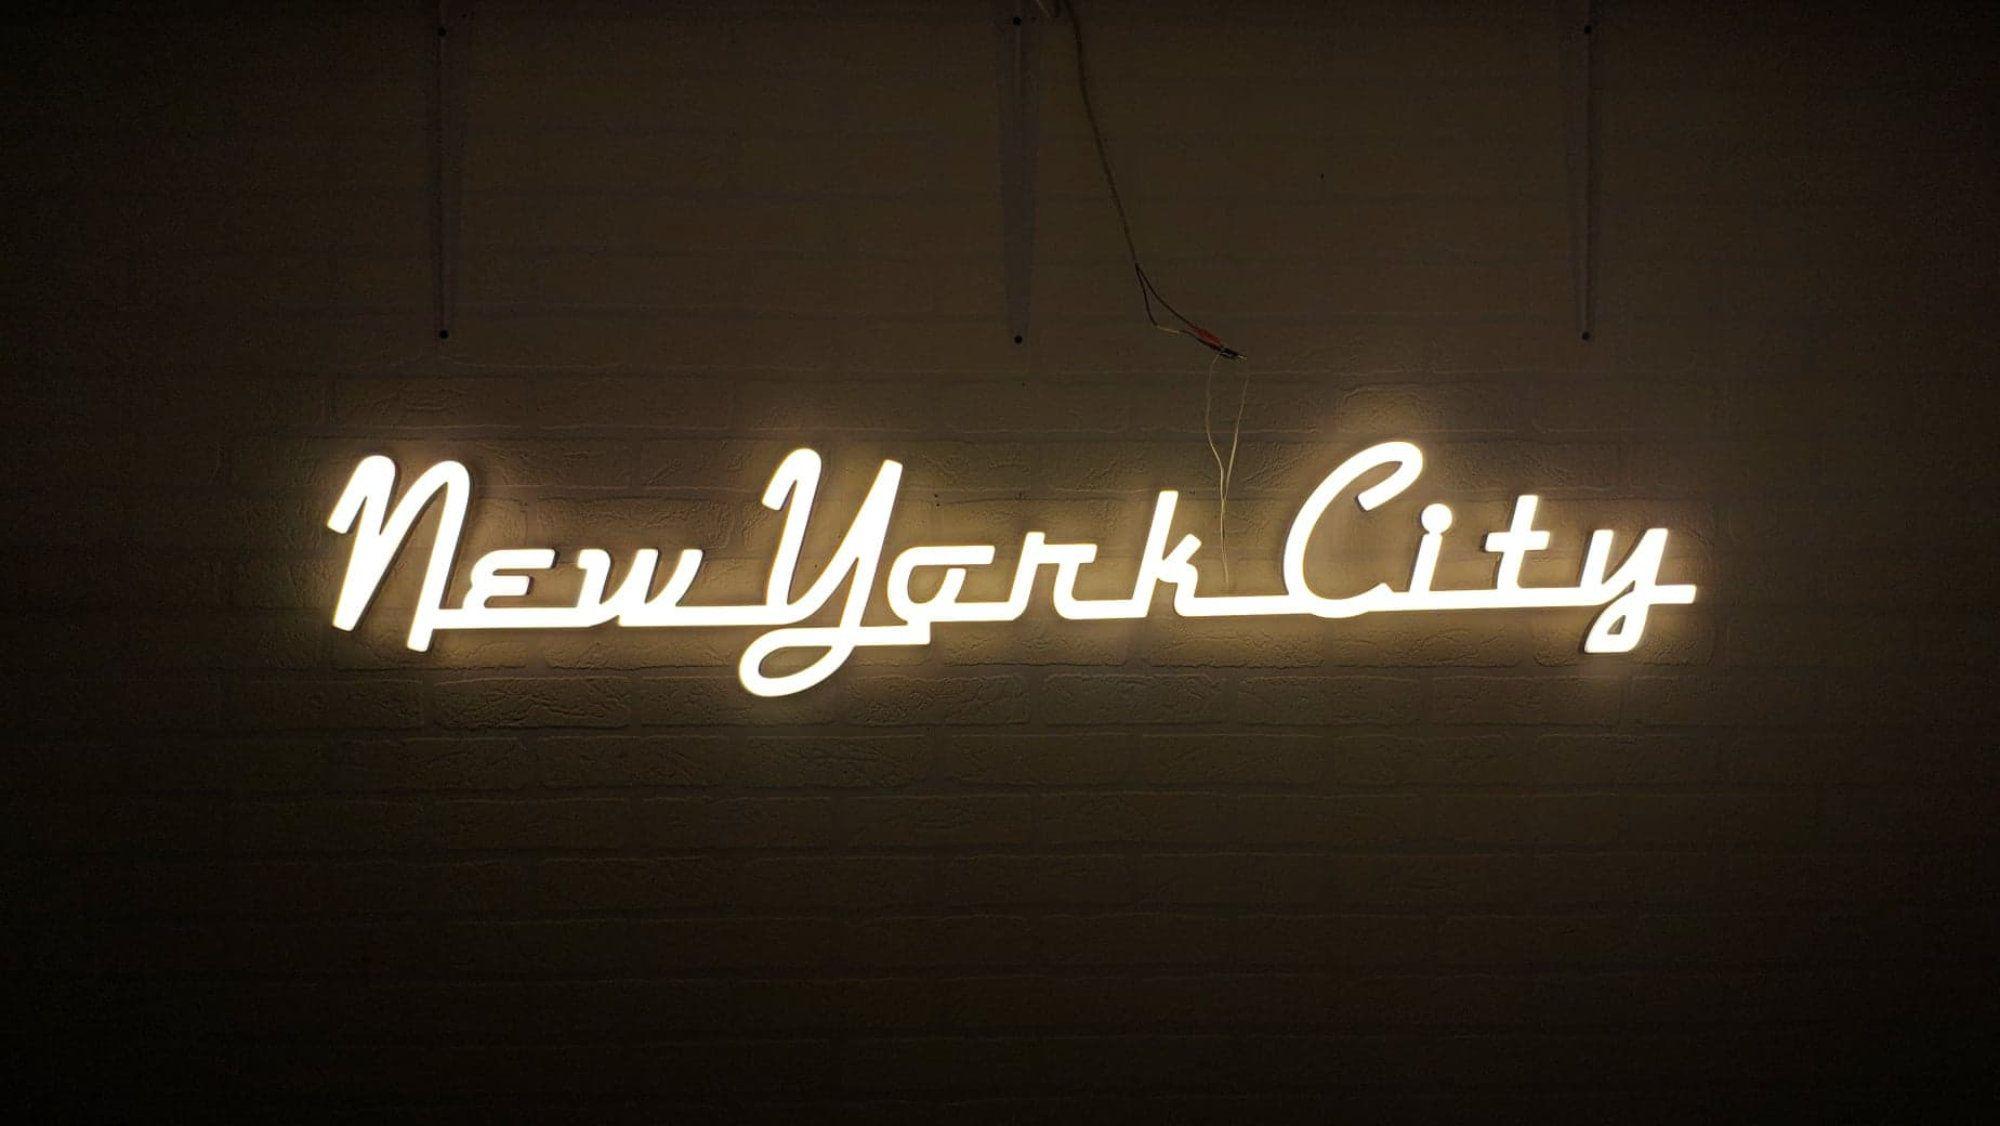 New York City Neon Sign Neon Decoration Custom Neon Decoration Ze Sklepu Neonworkshop Na Etsy Neon Decor Neon Signs Neon